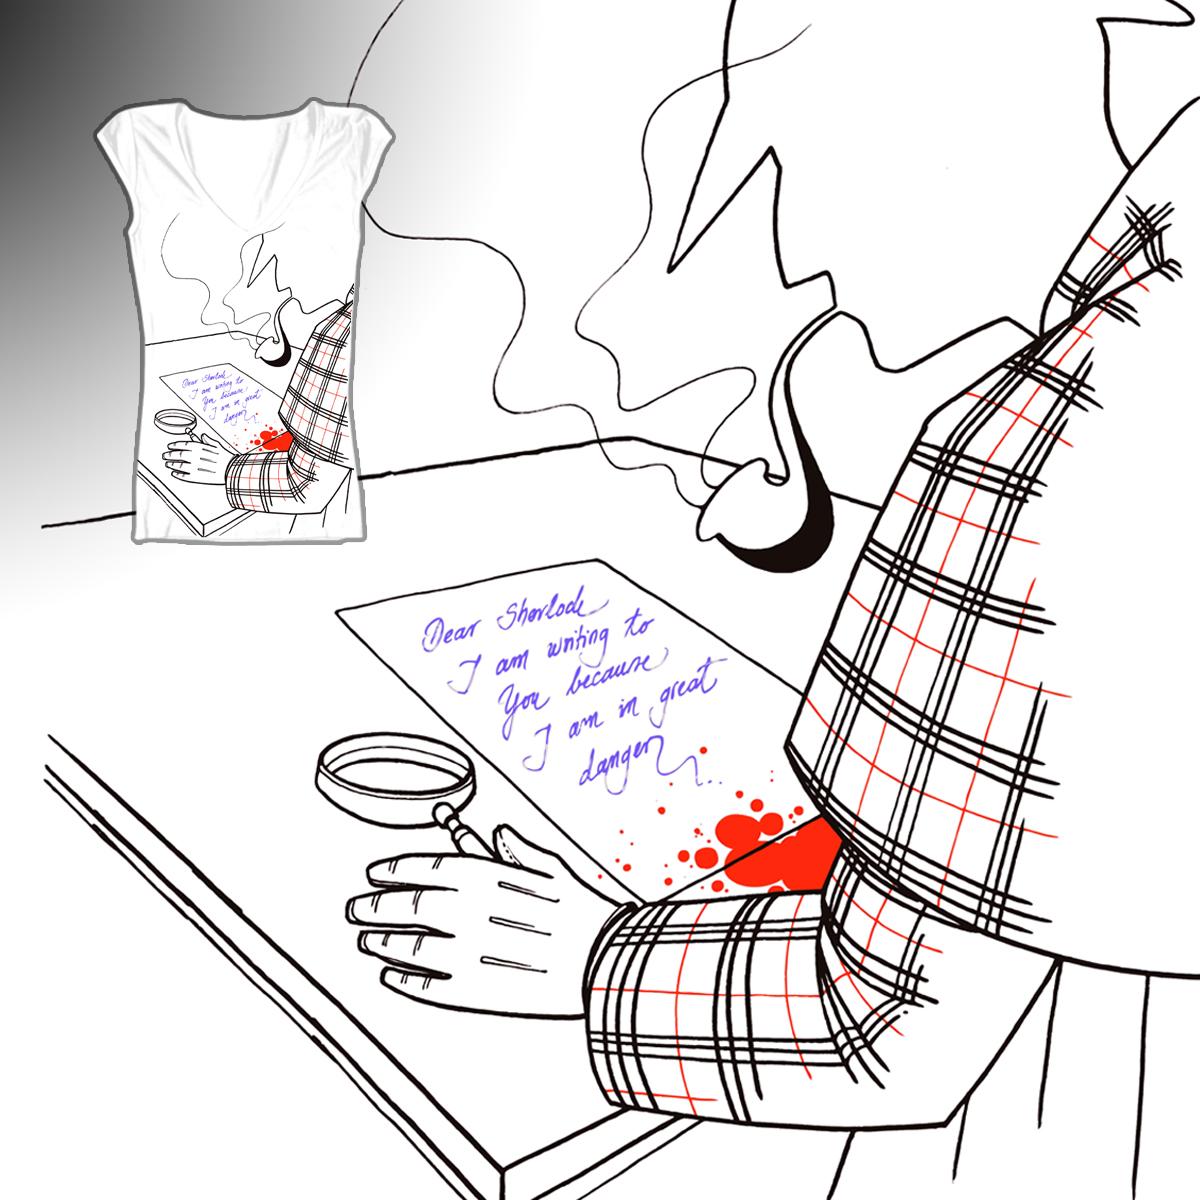 Can Mr. Sherlock unlock the mystery? by stjepan on Threadless